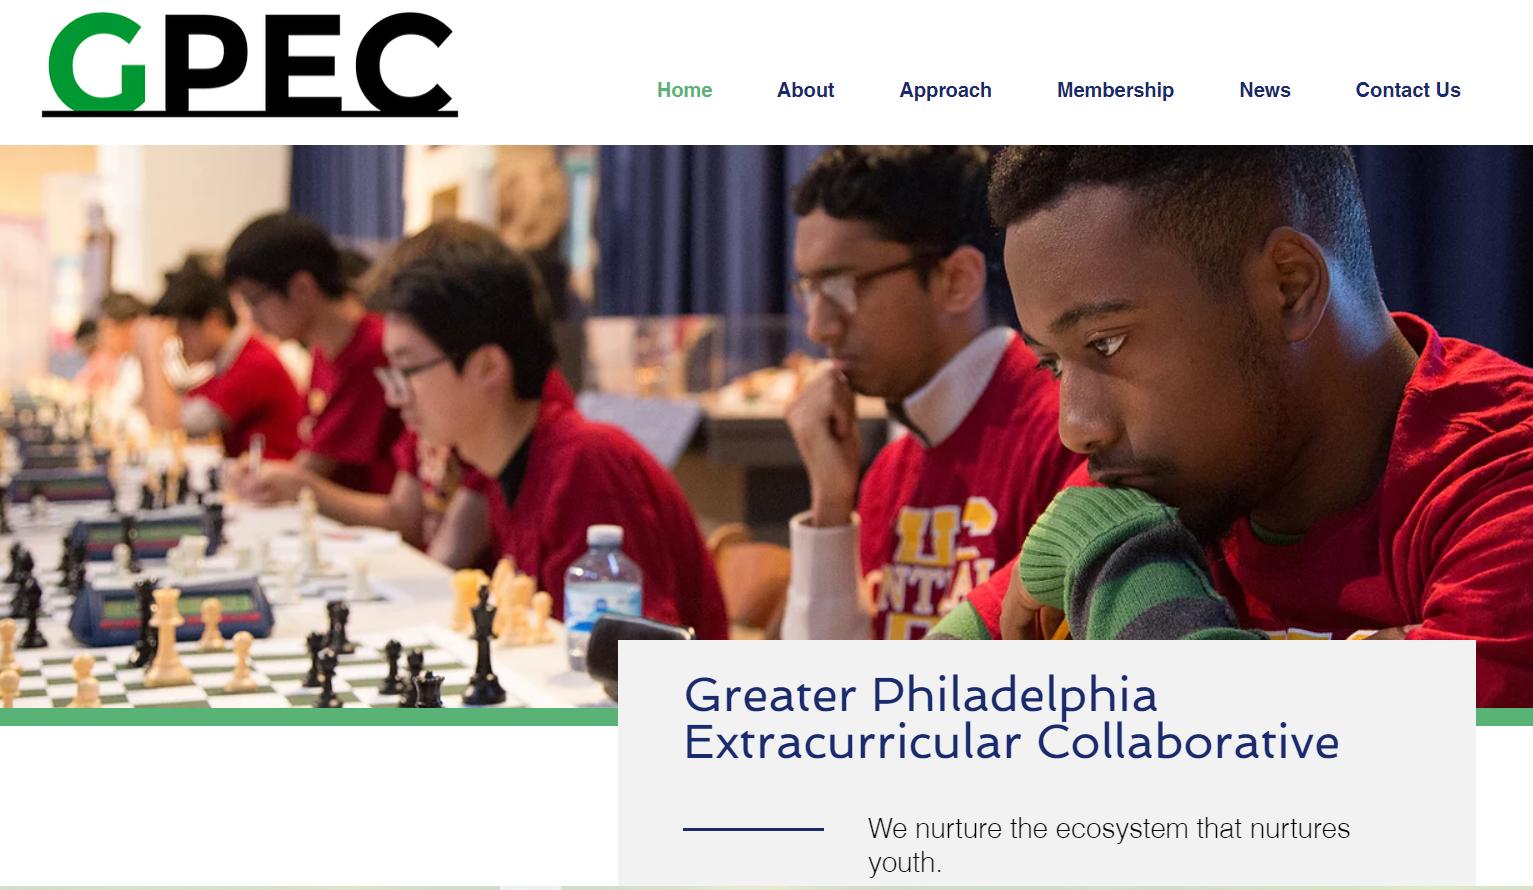 Greater Philadelphia Extracurricular Collaborative